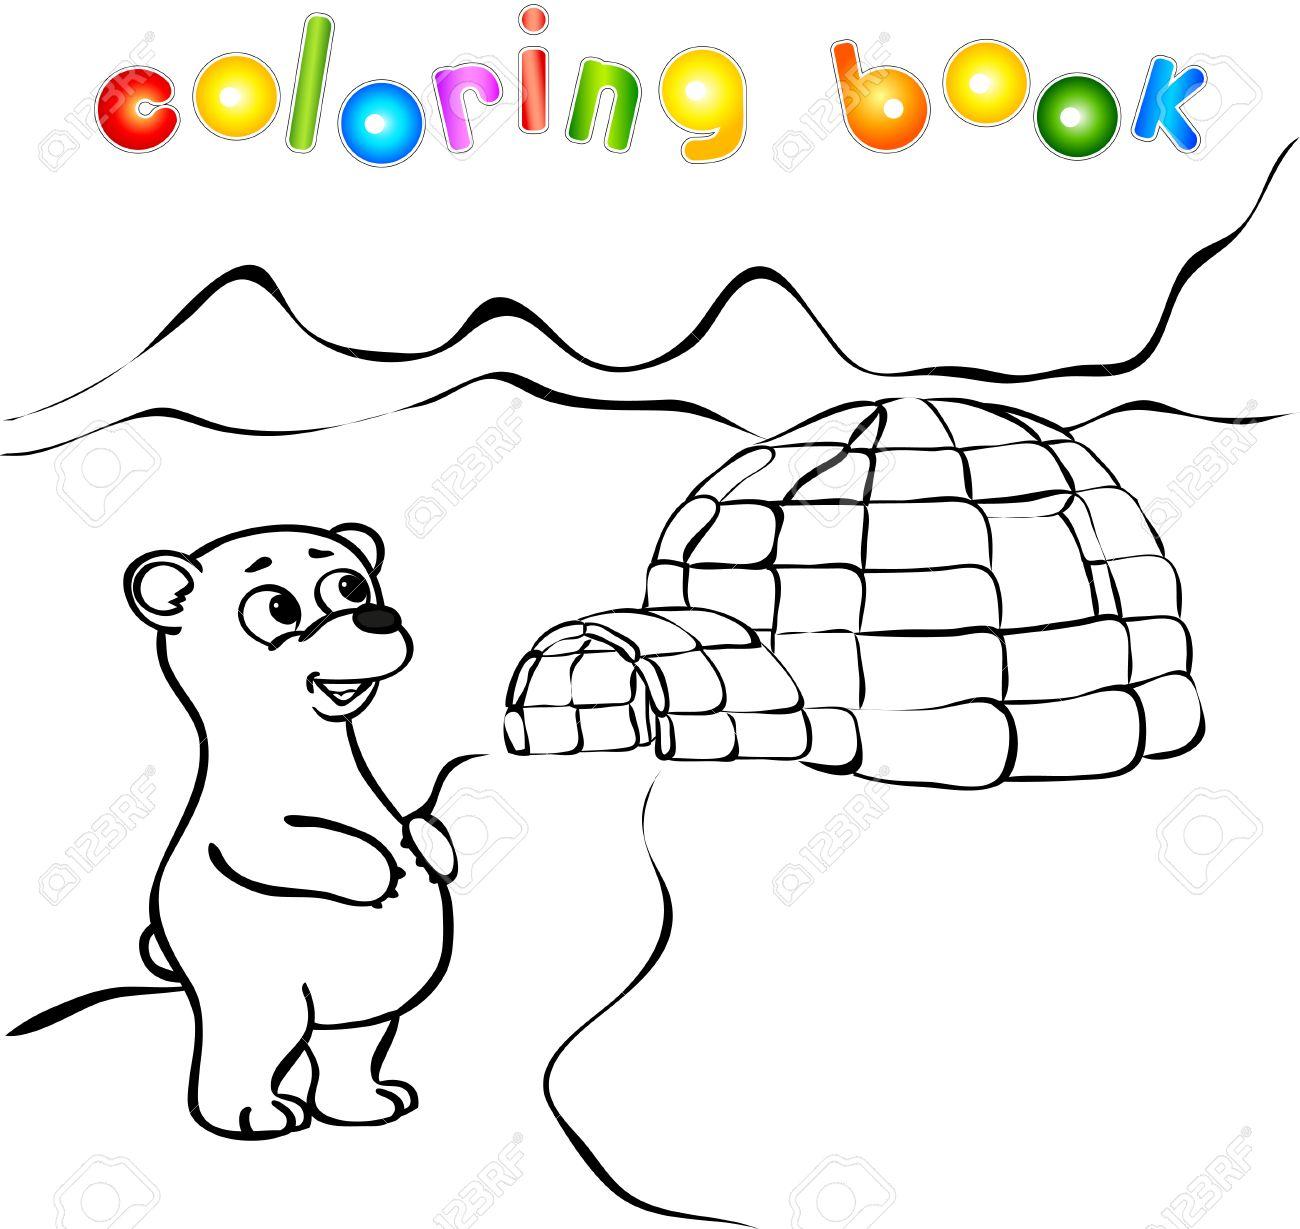 oso polar yurta de hielo para colorear igl ilustracin vectorial foto de archivo